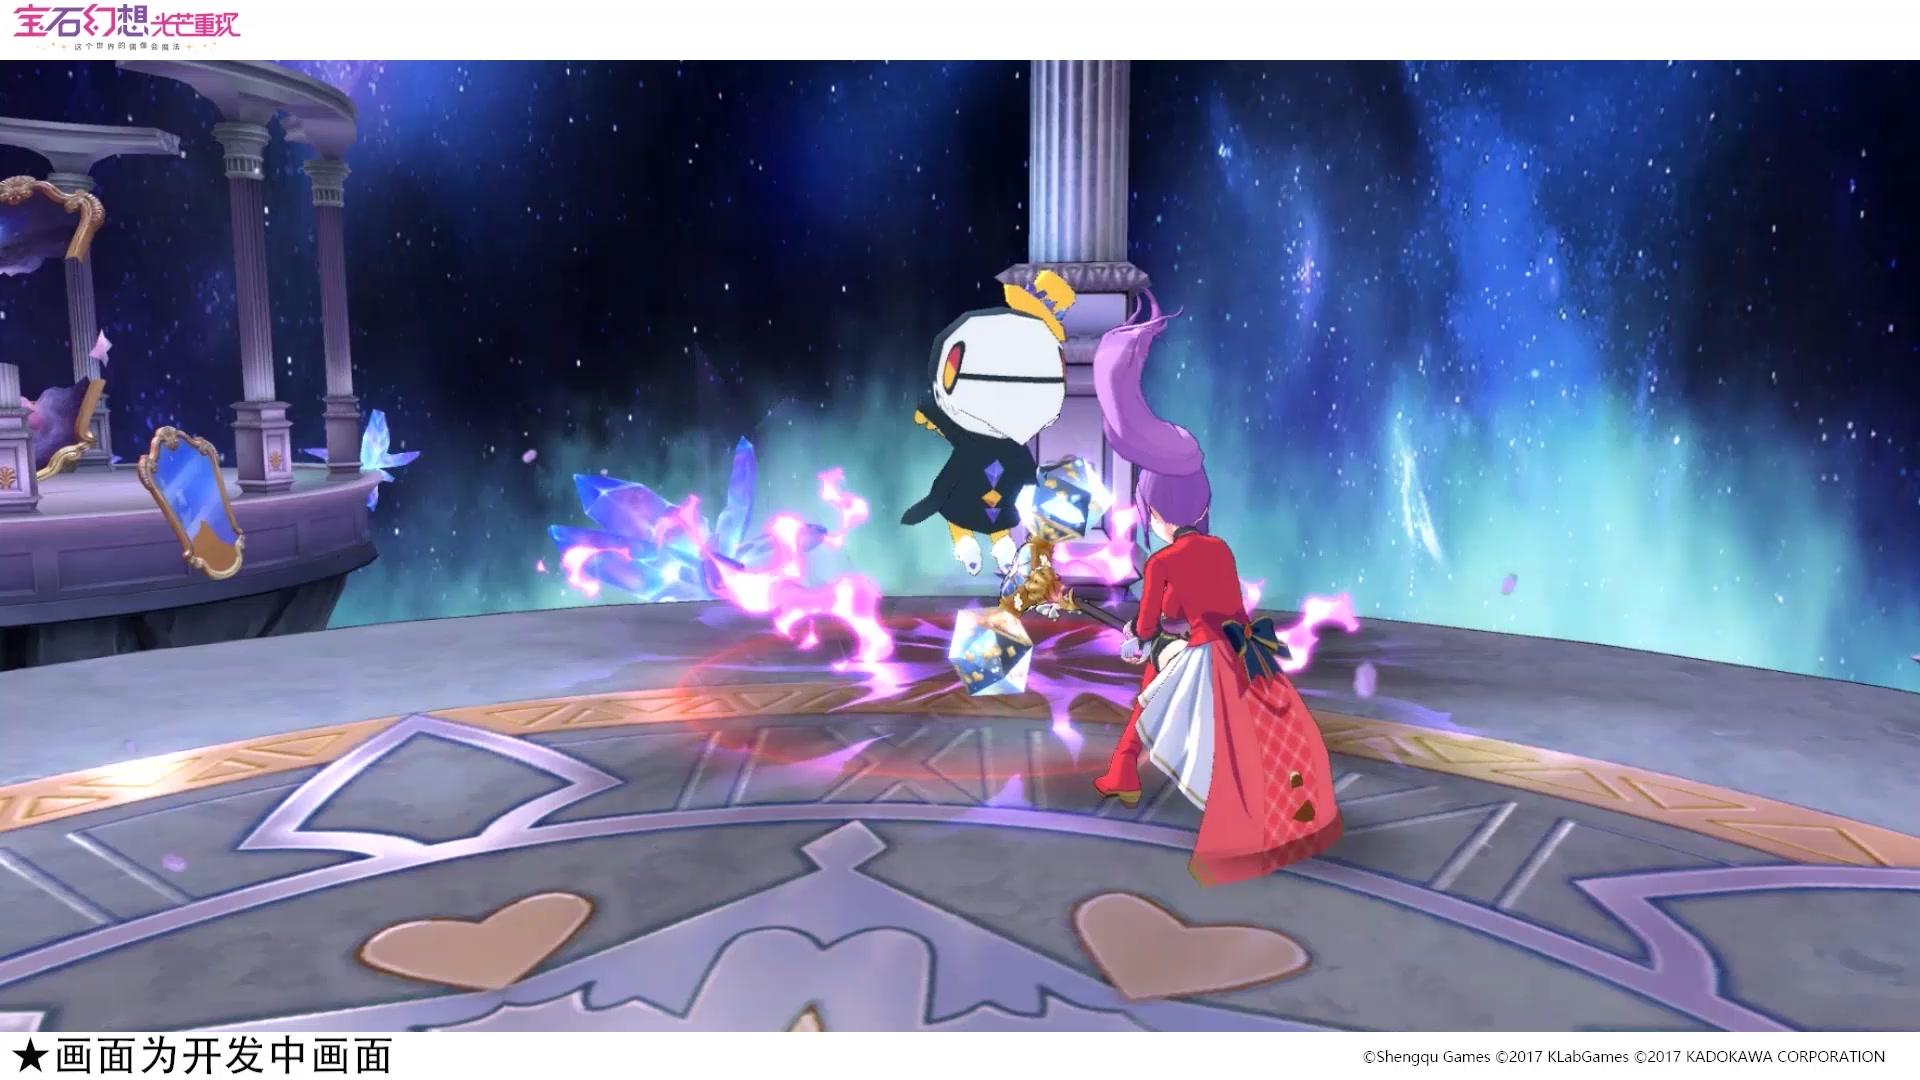 《宝石幻想:光芒重现》回合战斗Demo